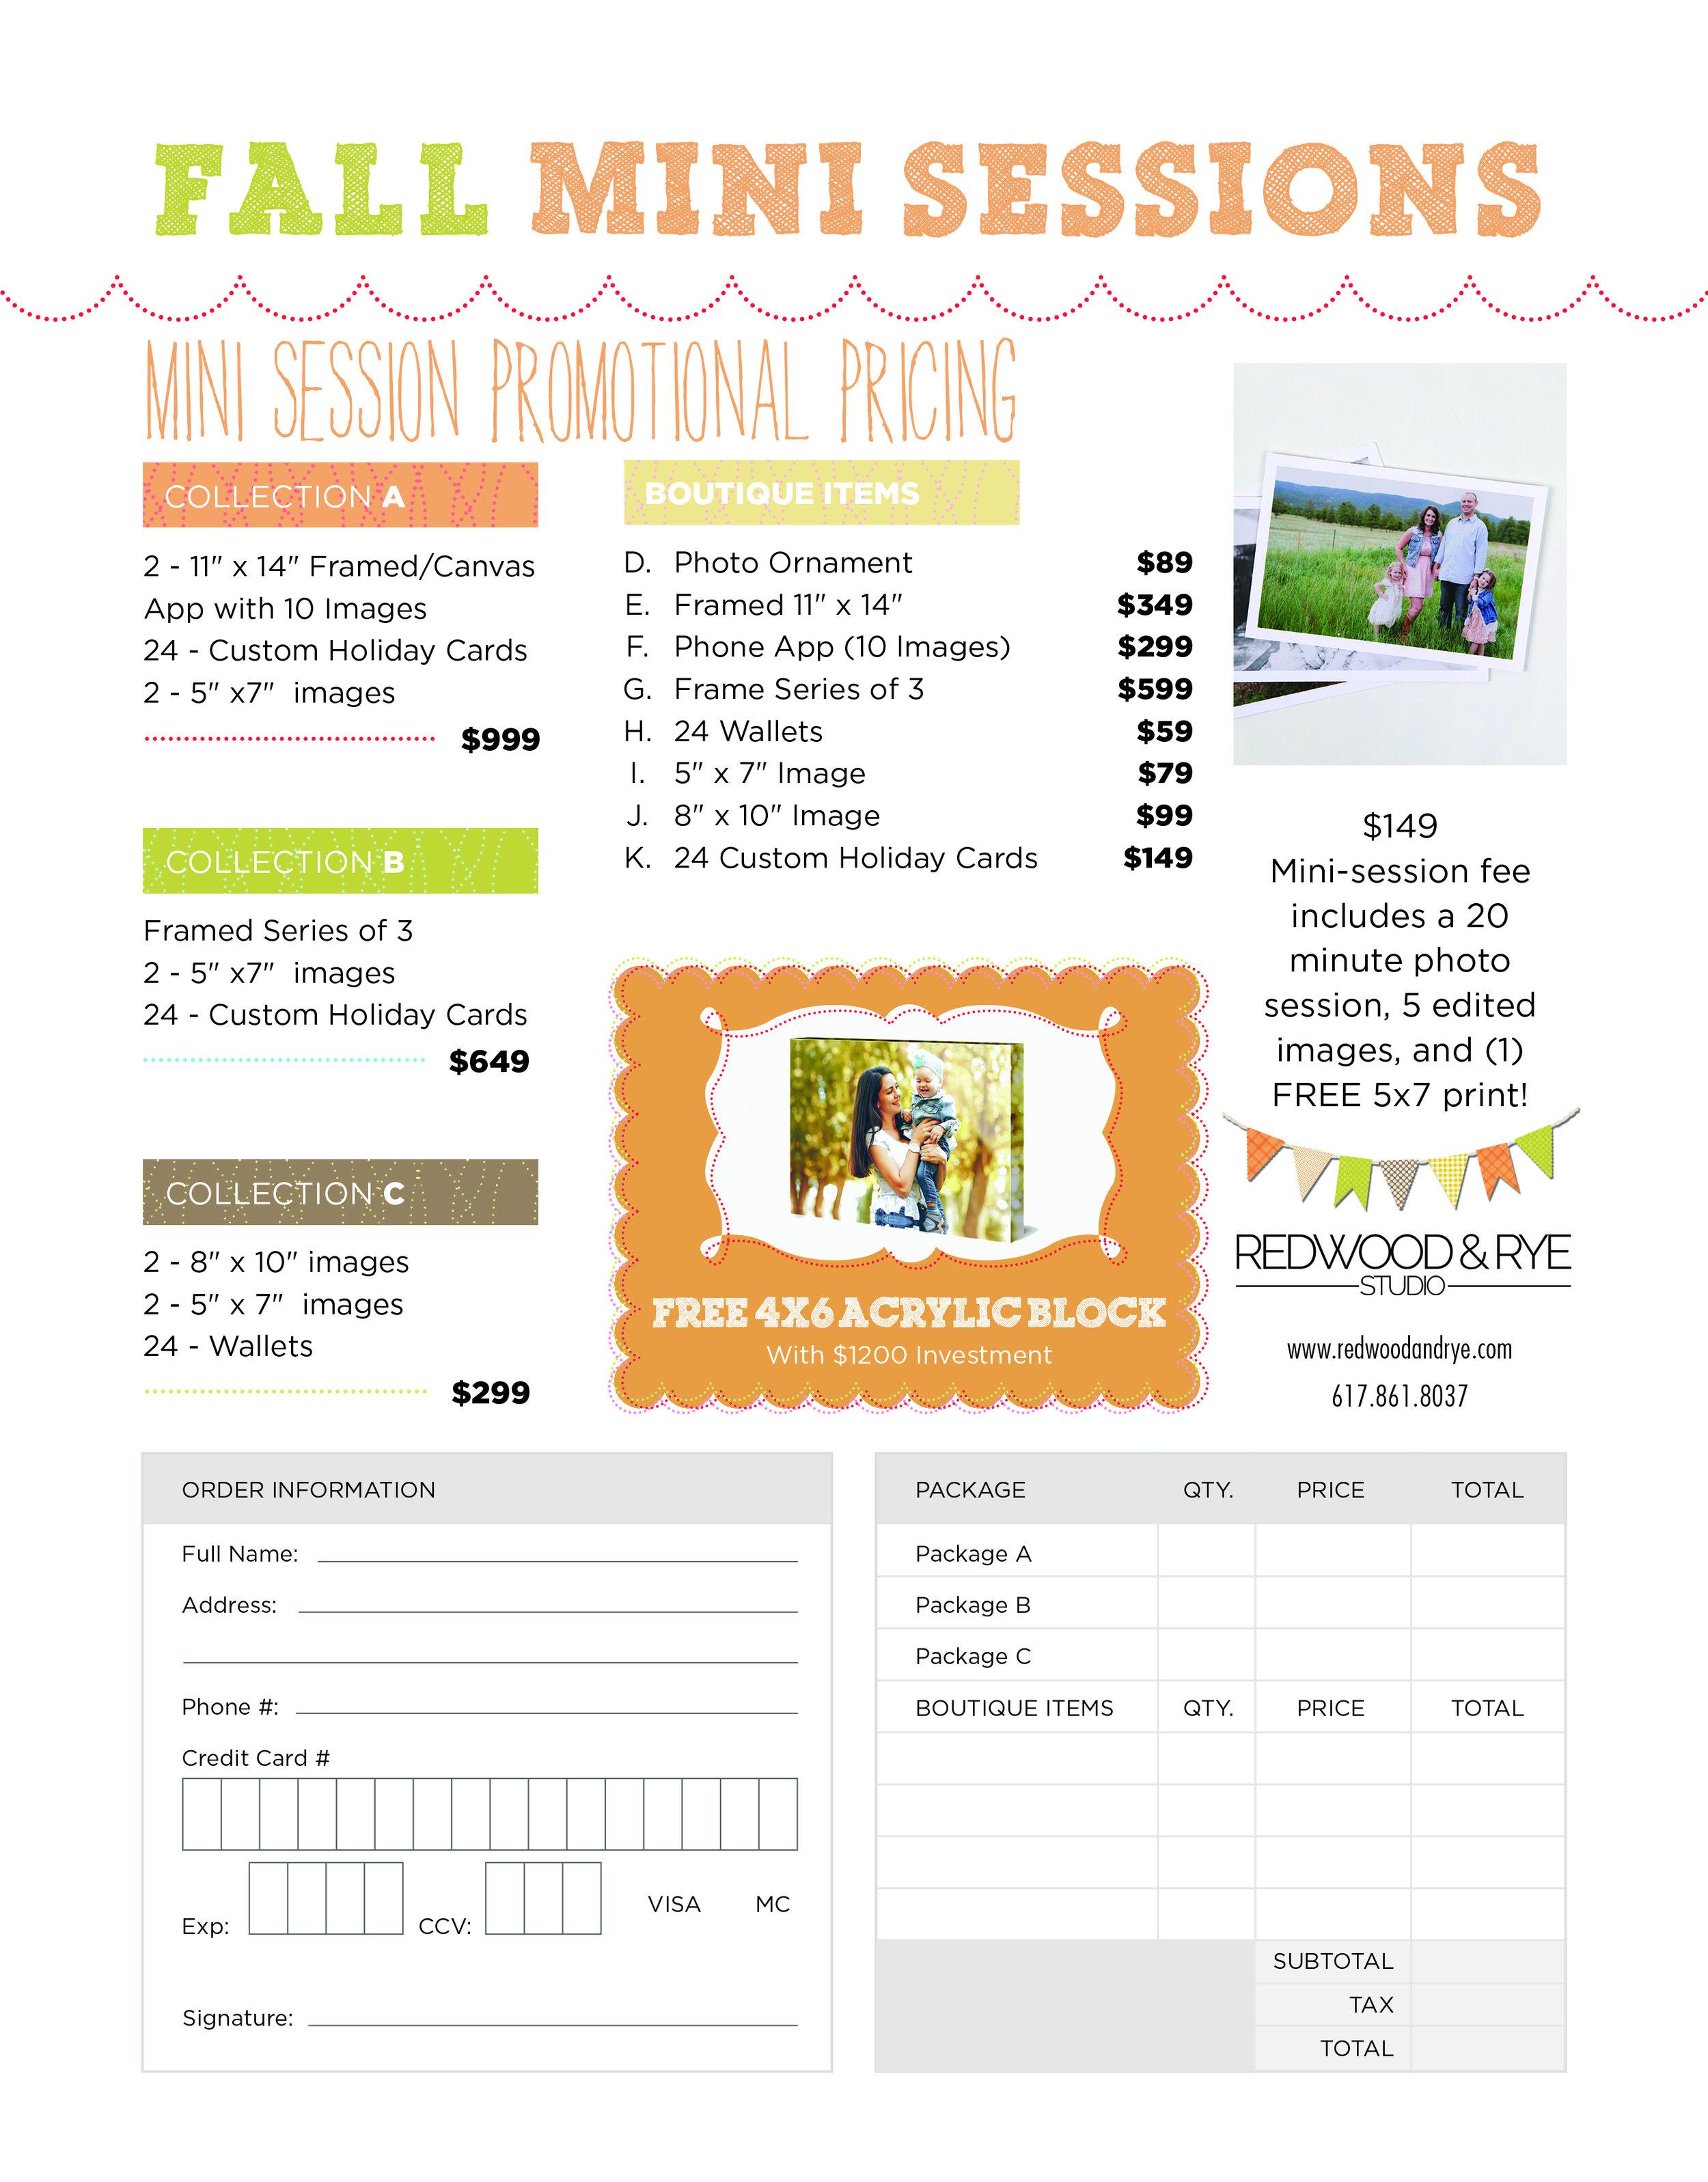 2018 Redwood & Rye Studio Fall Mini Session Product Order Form